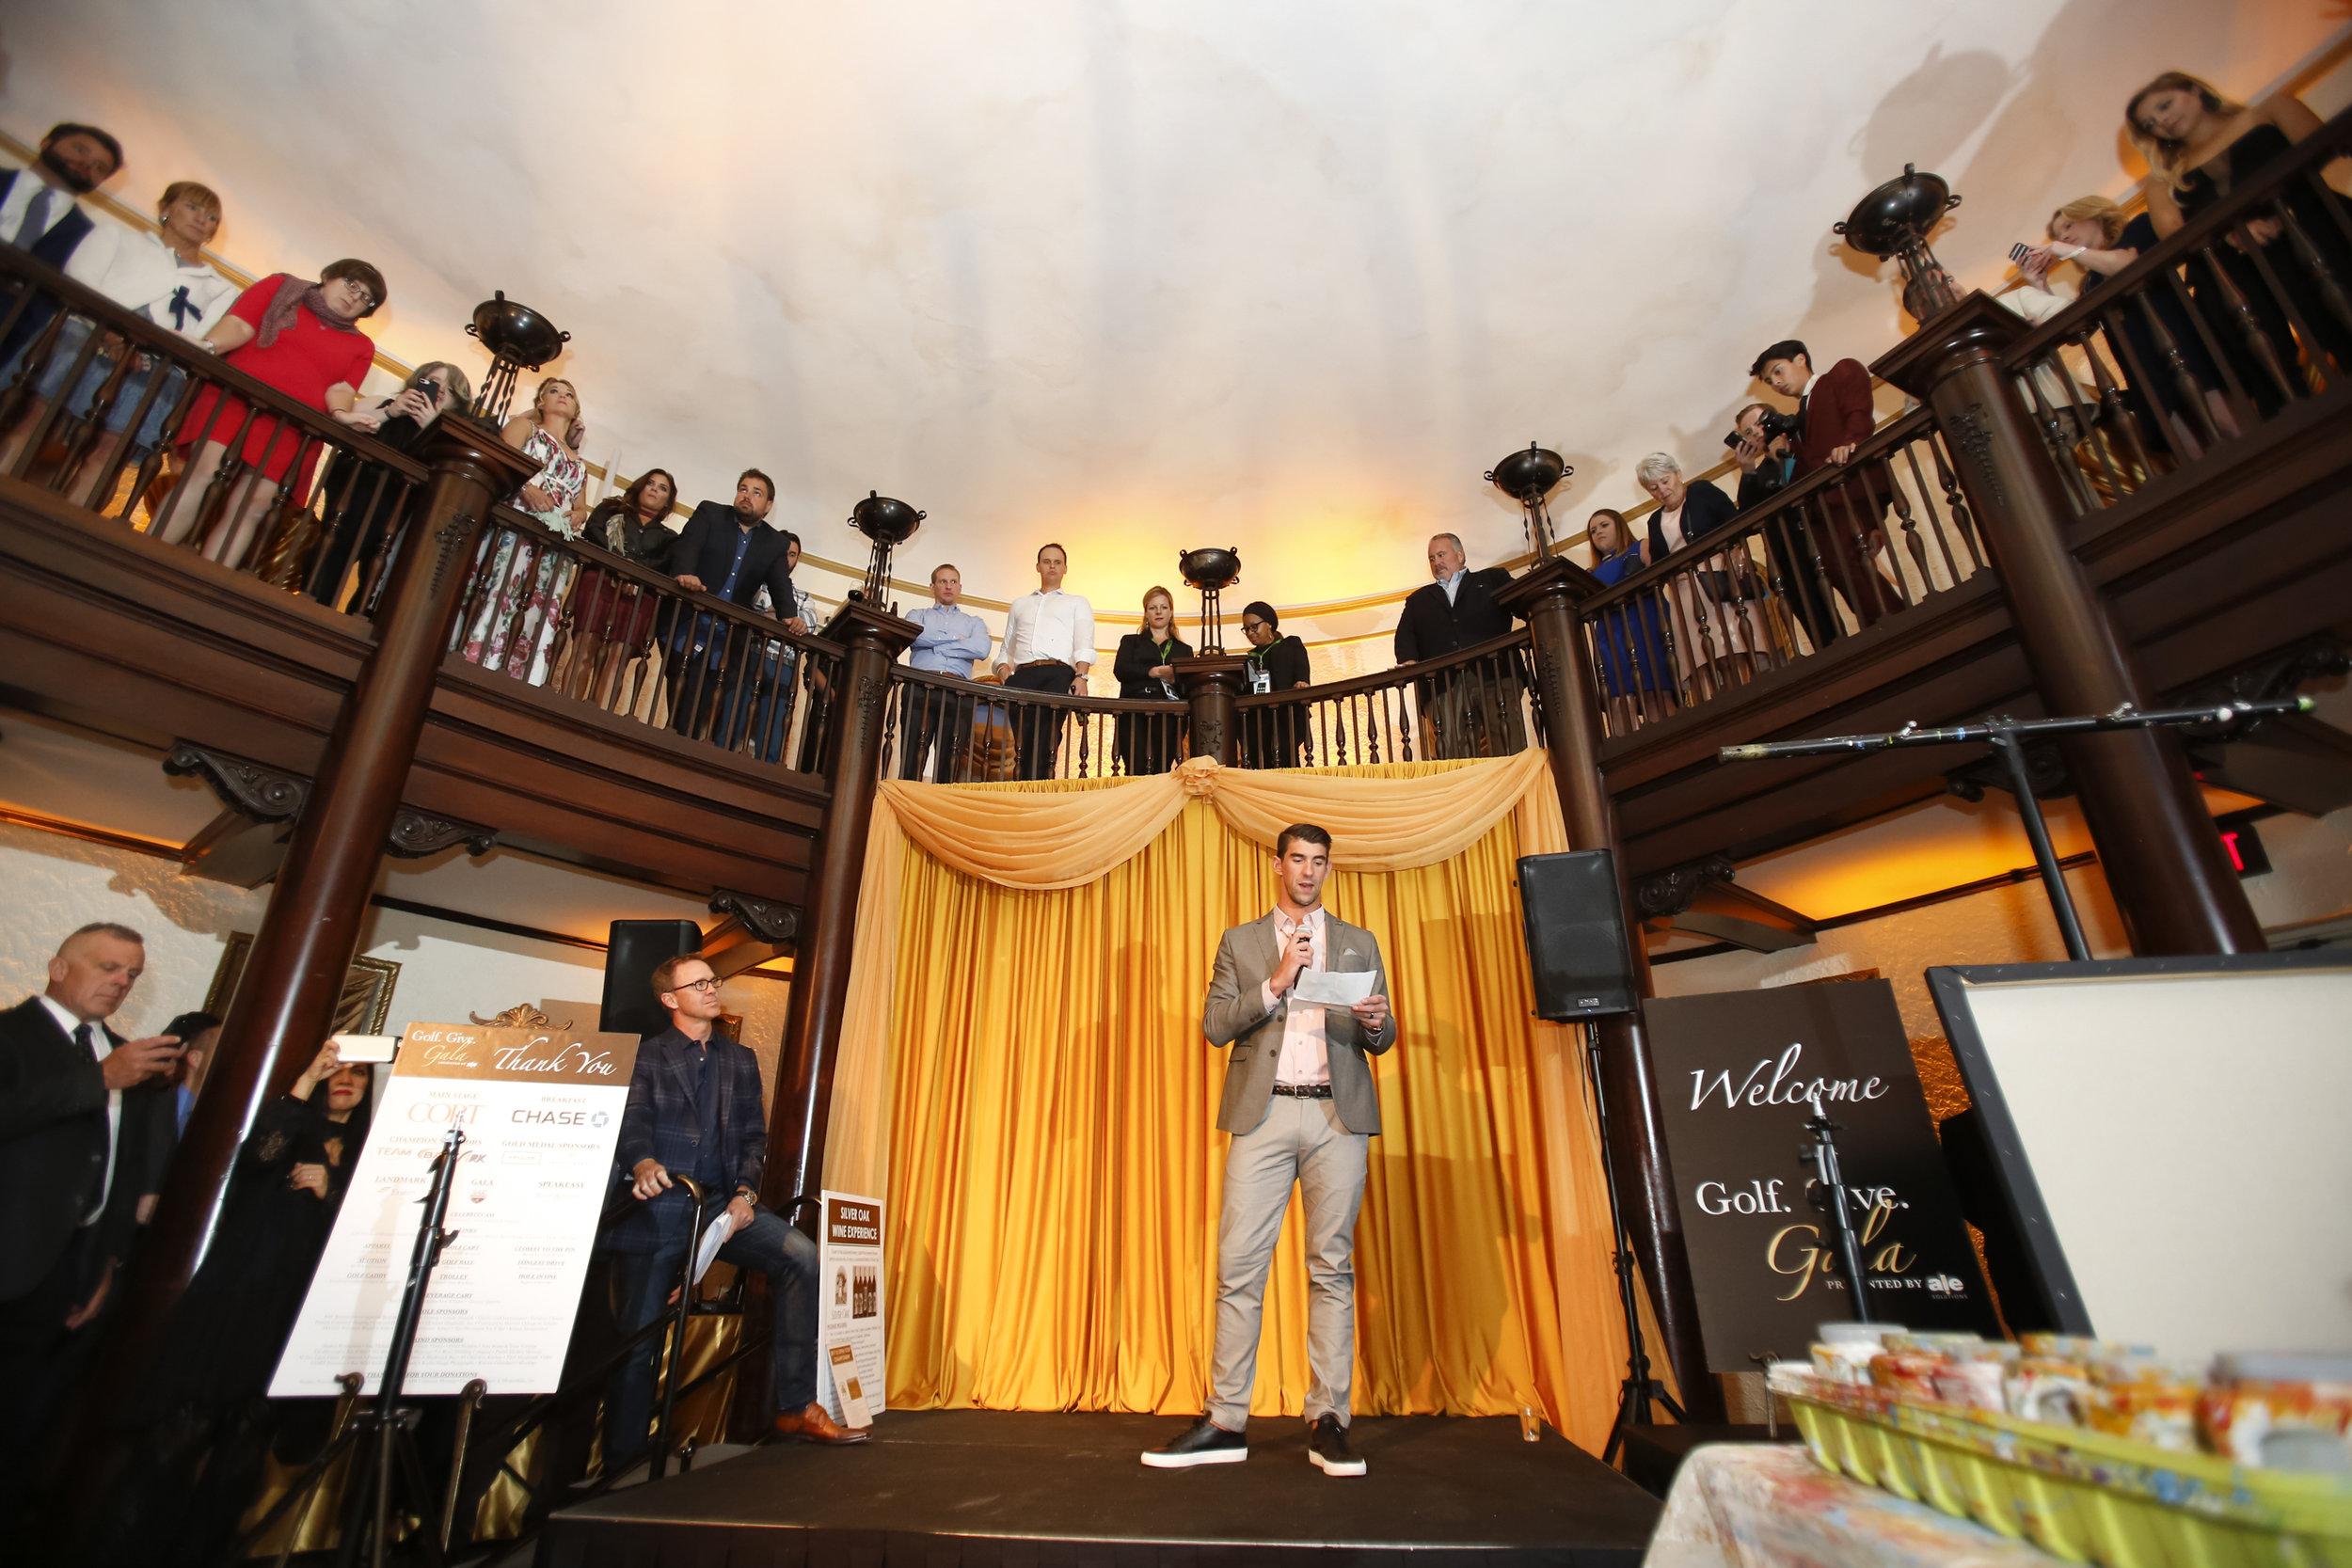 golf-give-gala-celebrity-michael-phelps-jason-day-event-photographer-madison-wi-7.jpg